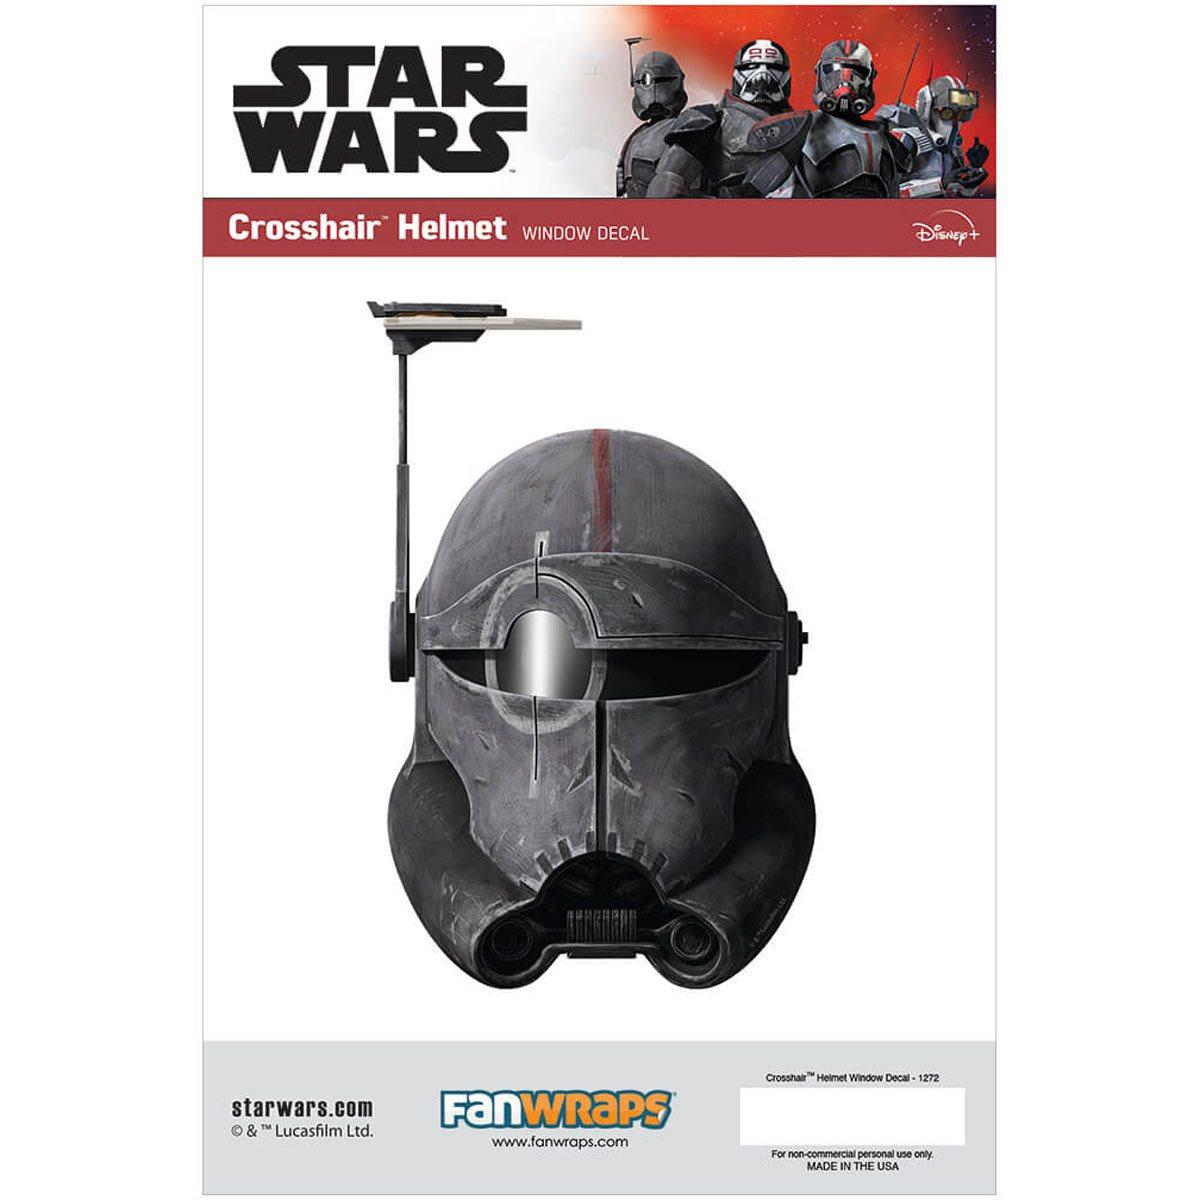 Star Wars Crosshair Helmet Window Decal画像